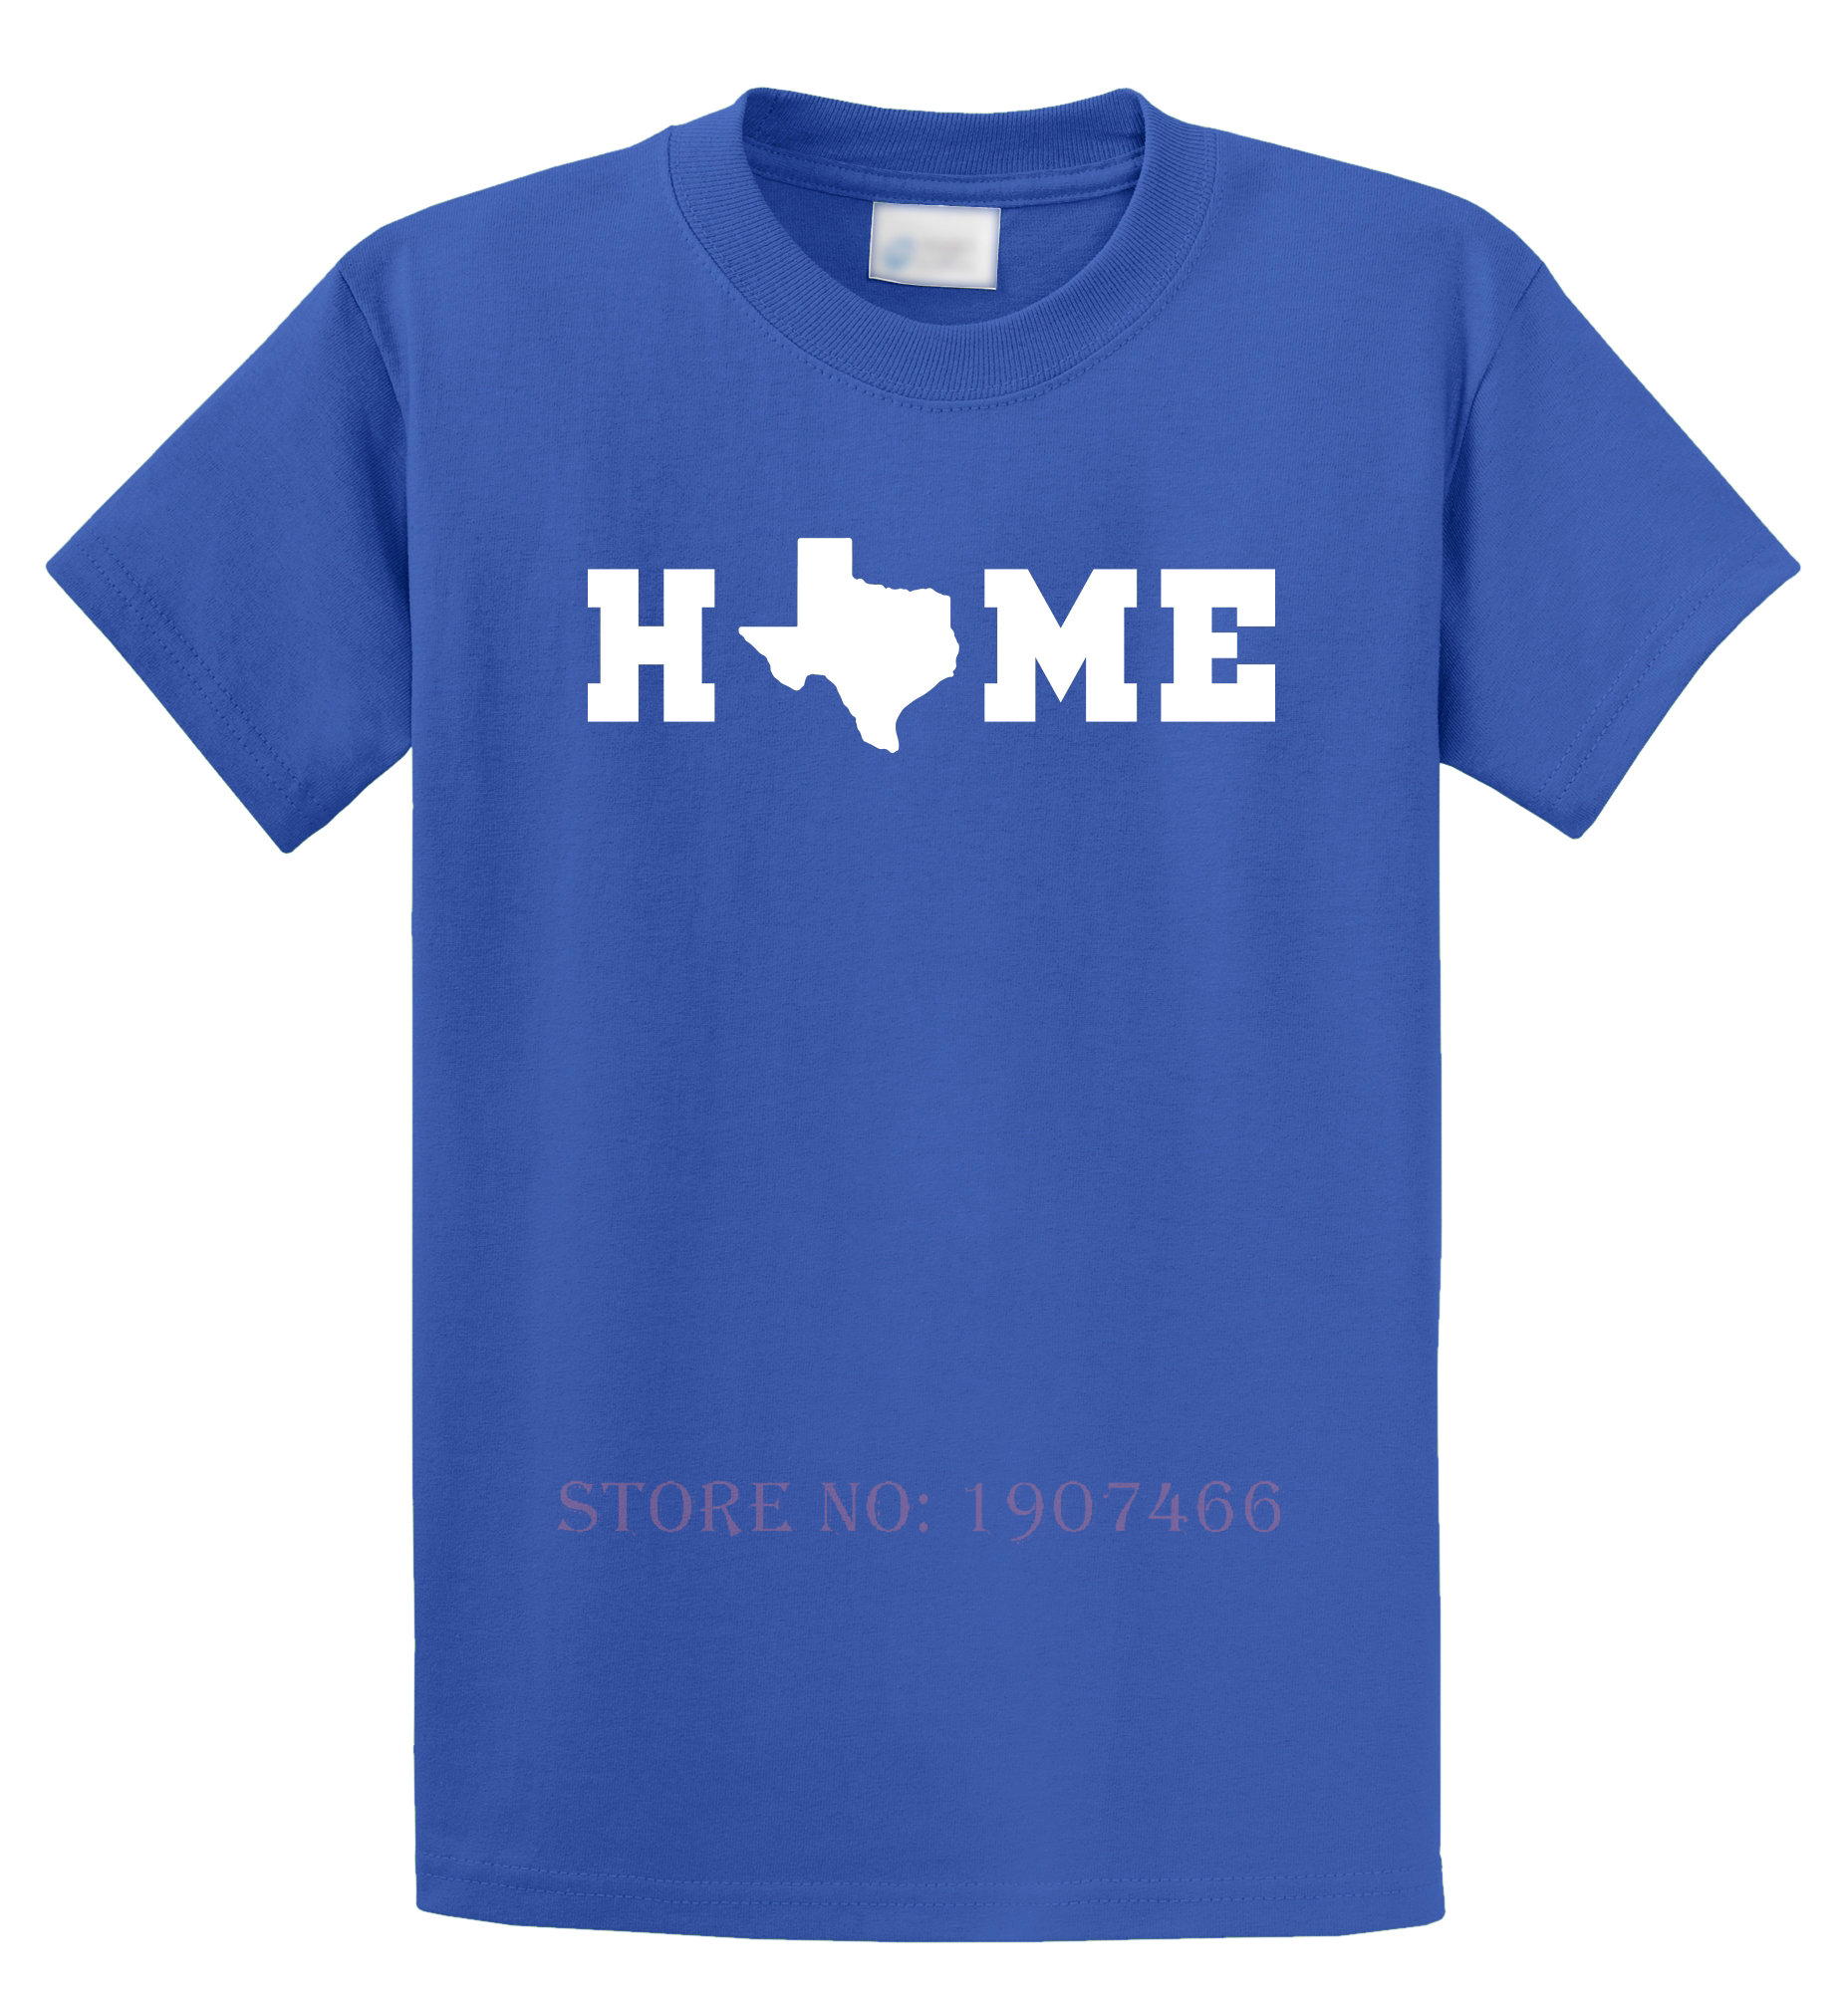 Home Texas Map T Shirt Texas Pride Texan Lonestar State Tee Shirt S 5XL 16 Cols